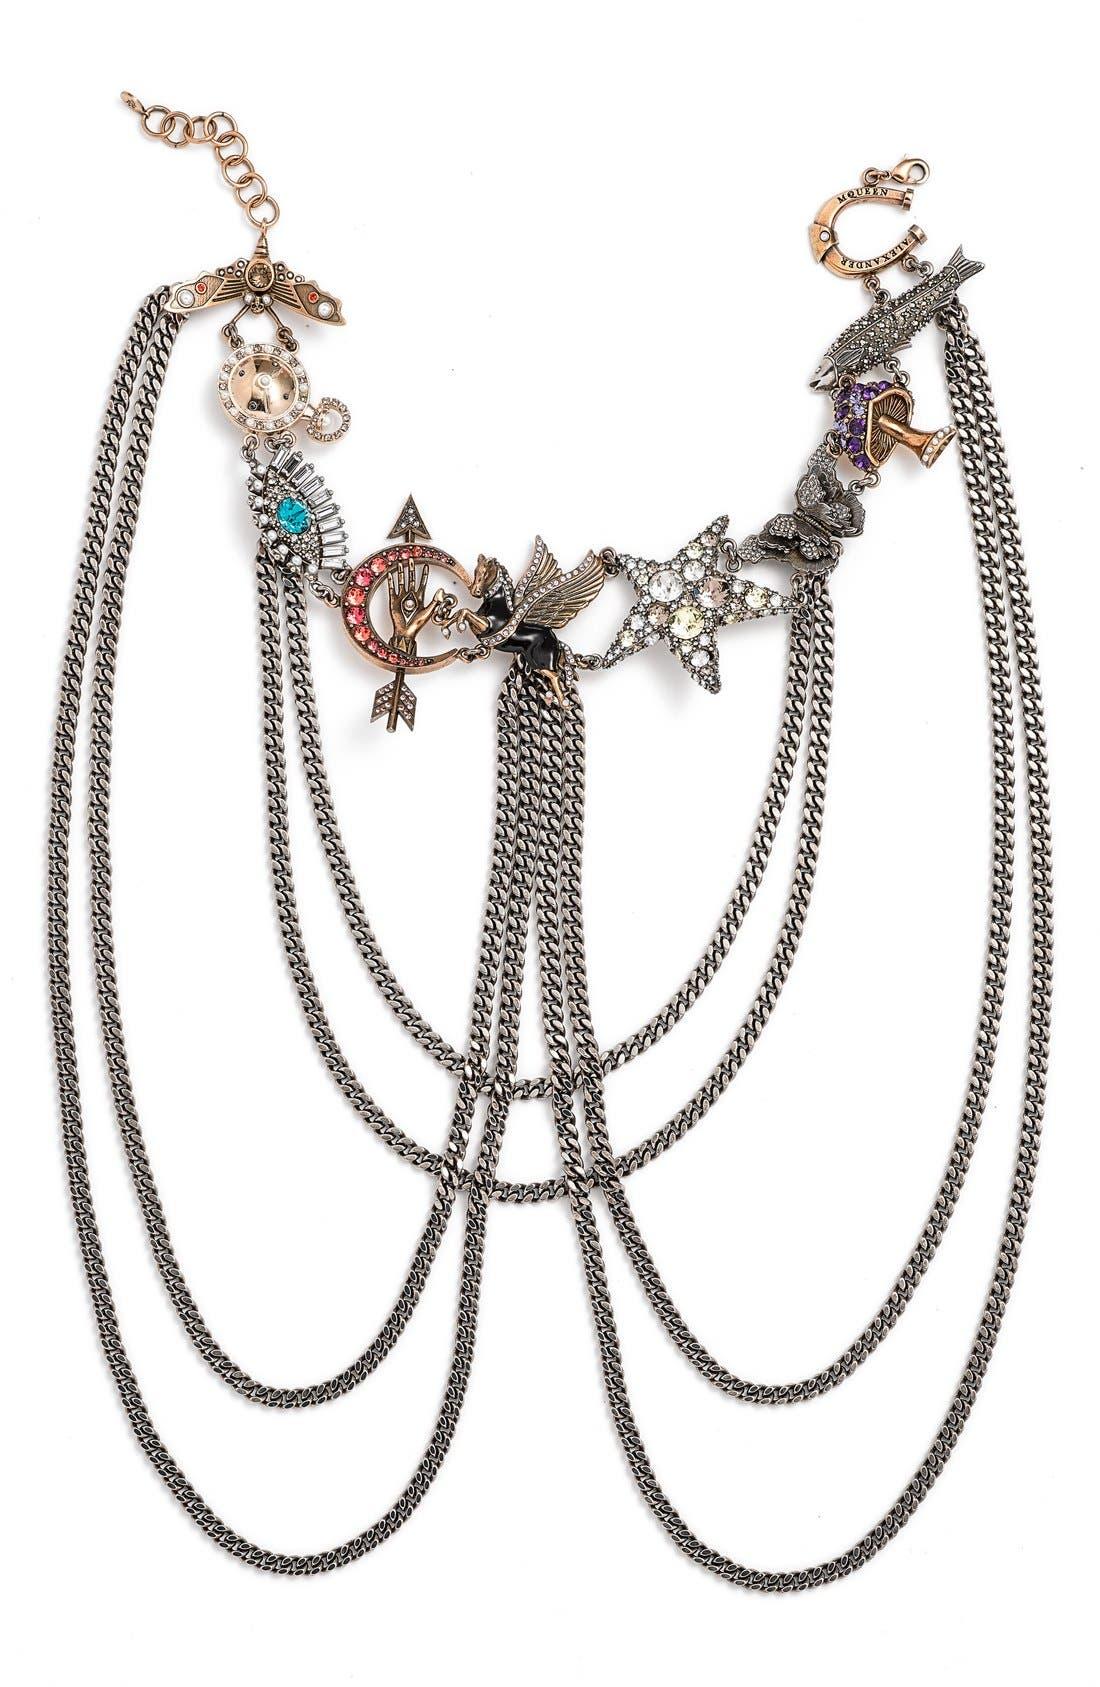 Alternate Image 1 Selected - Alexander McQueen 'Pegasus' Multistrand Necklace